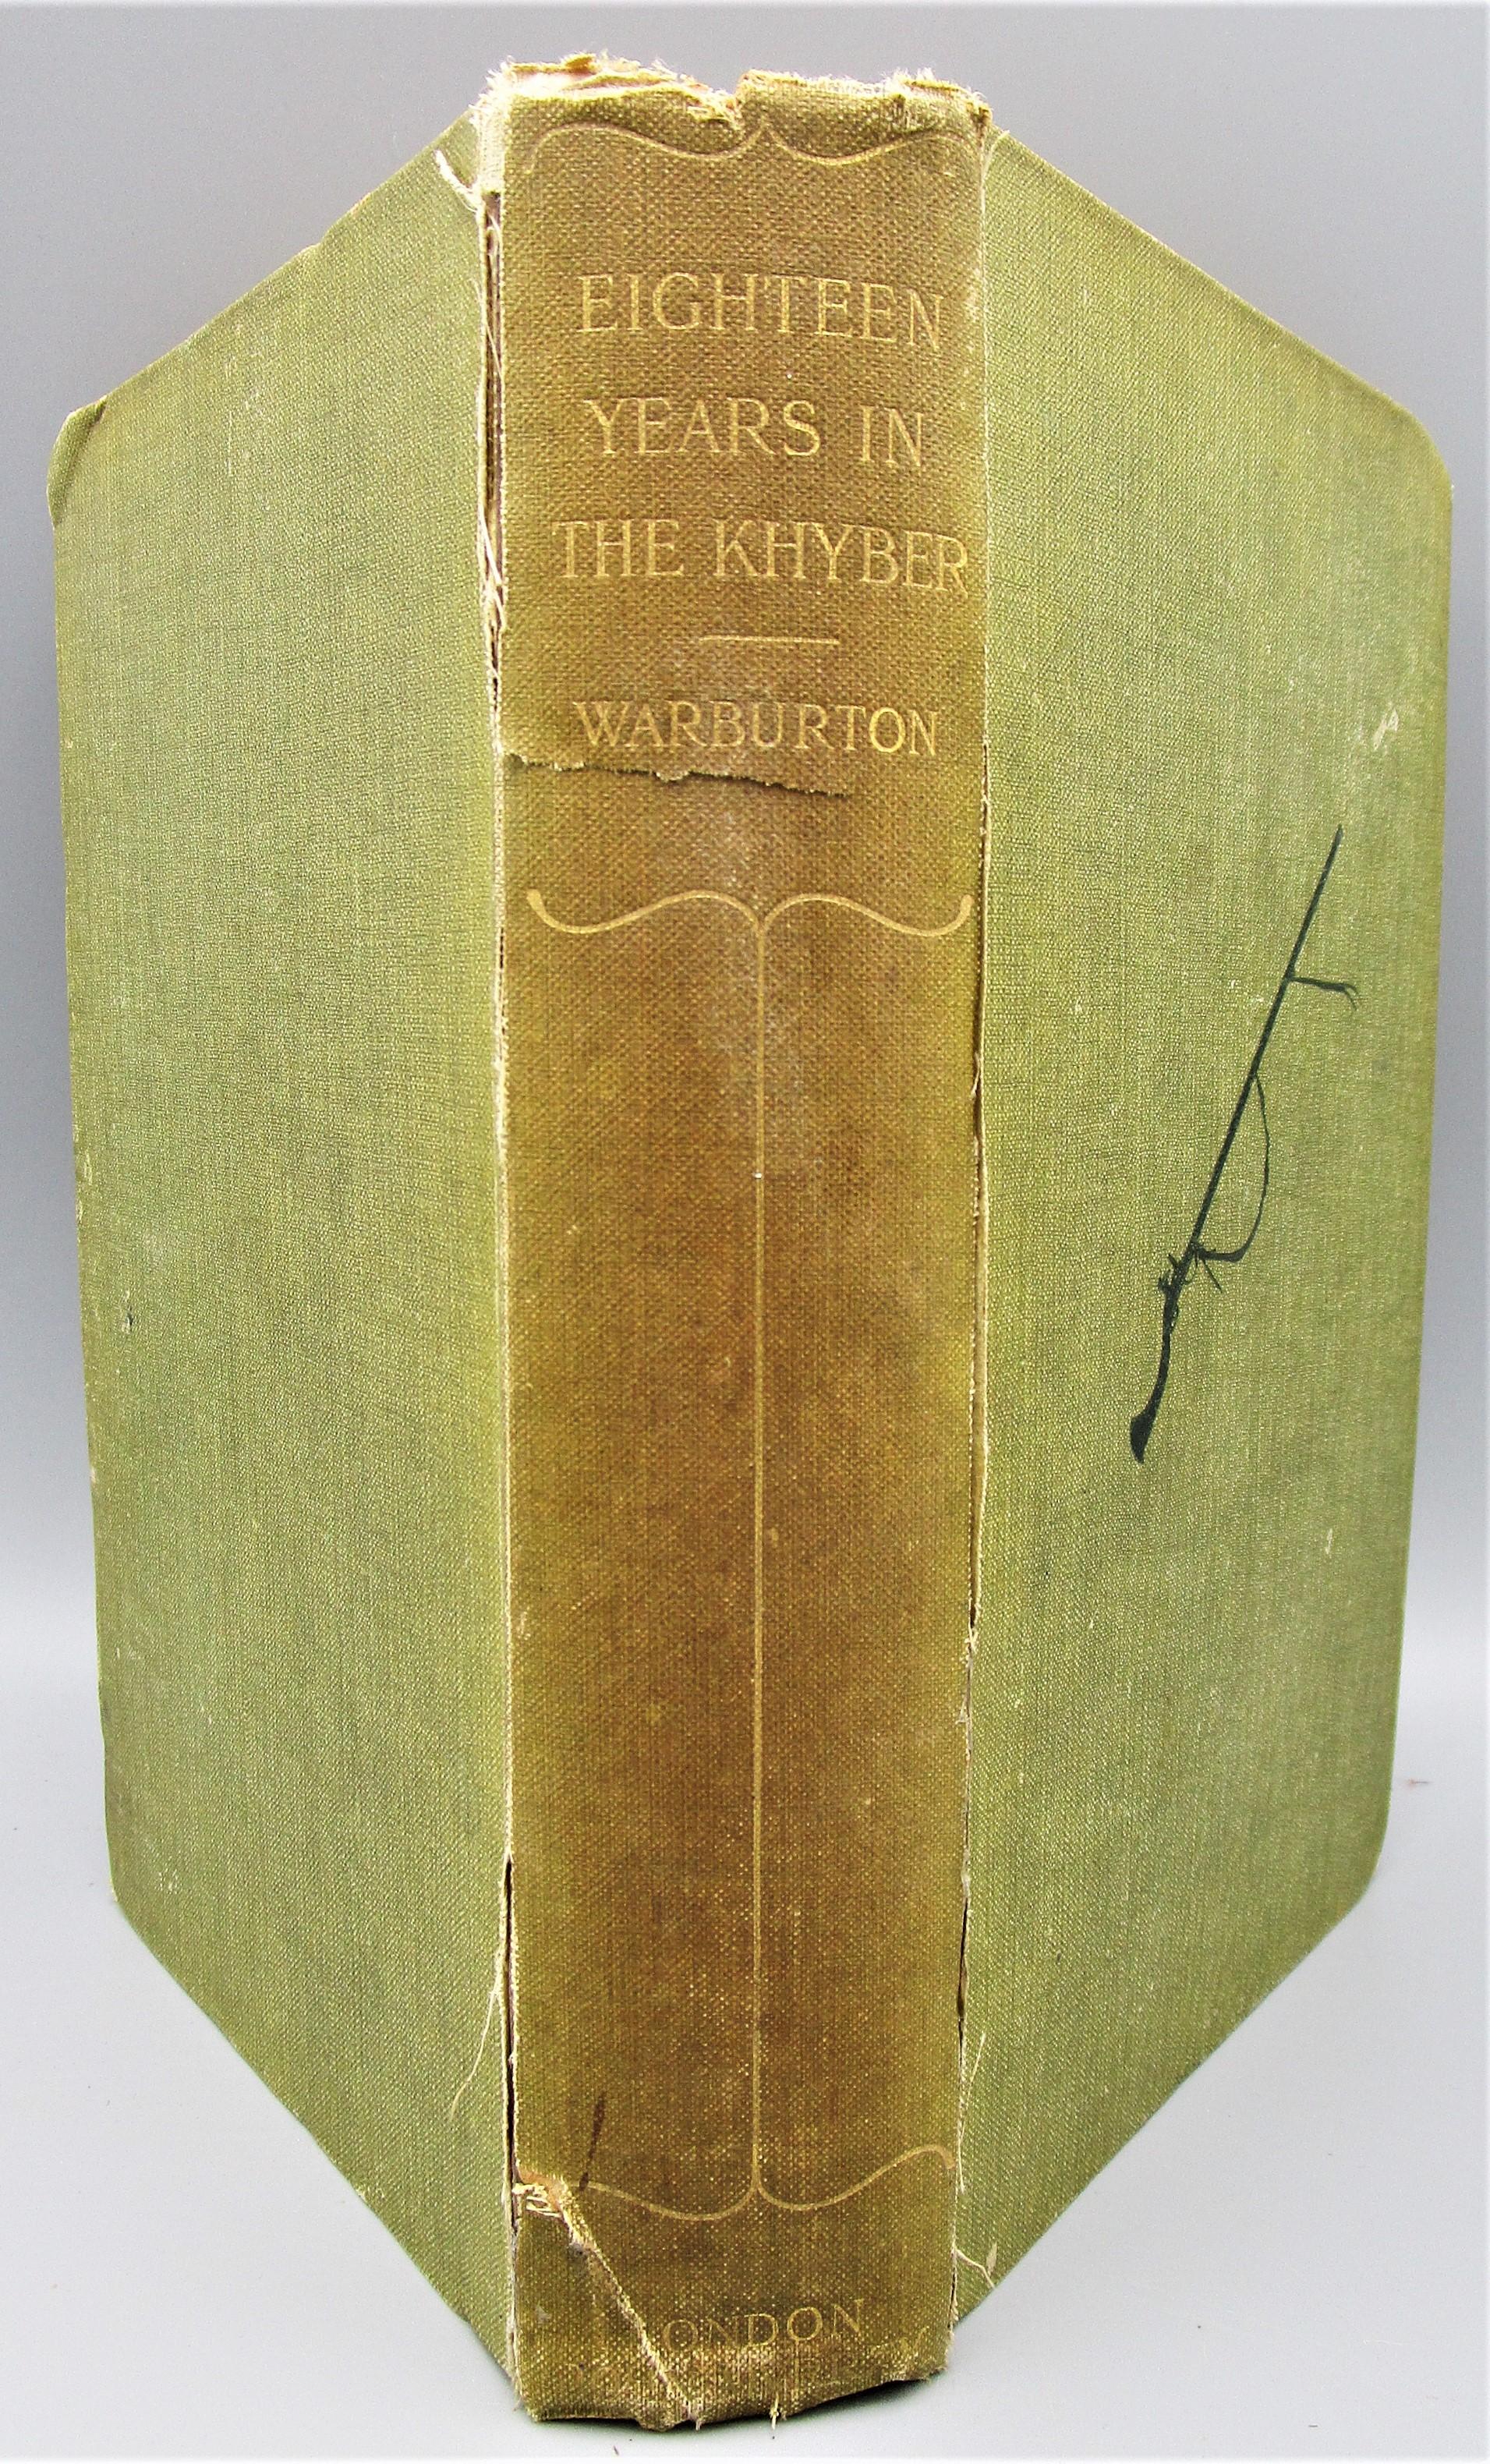 EIGHTEEN YEARS IN THE KHYBER (1879-1898), by Robert Warburton - 1900 [1st Ed]